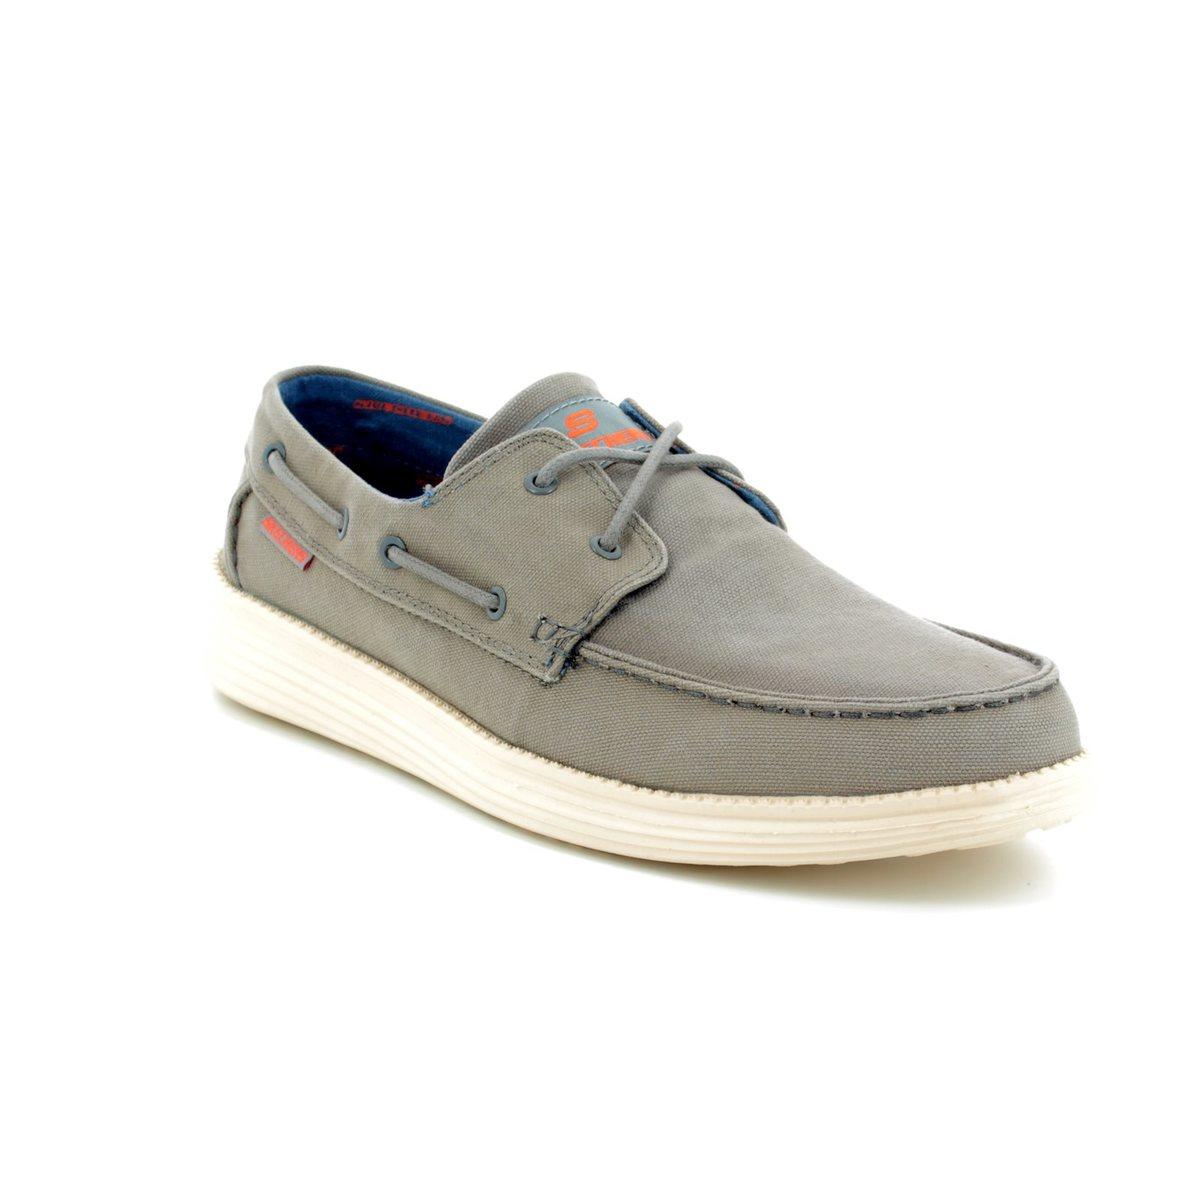 e7763a492354 Skechers Status Melec 64644 CHAR Charcoal casual shoes